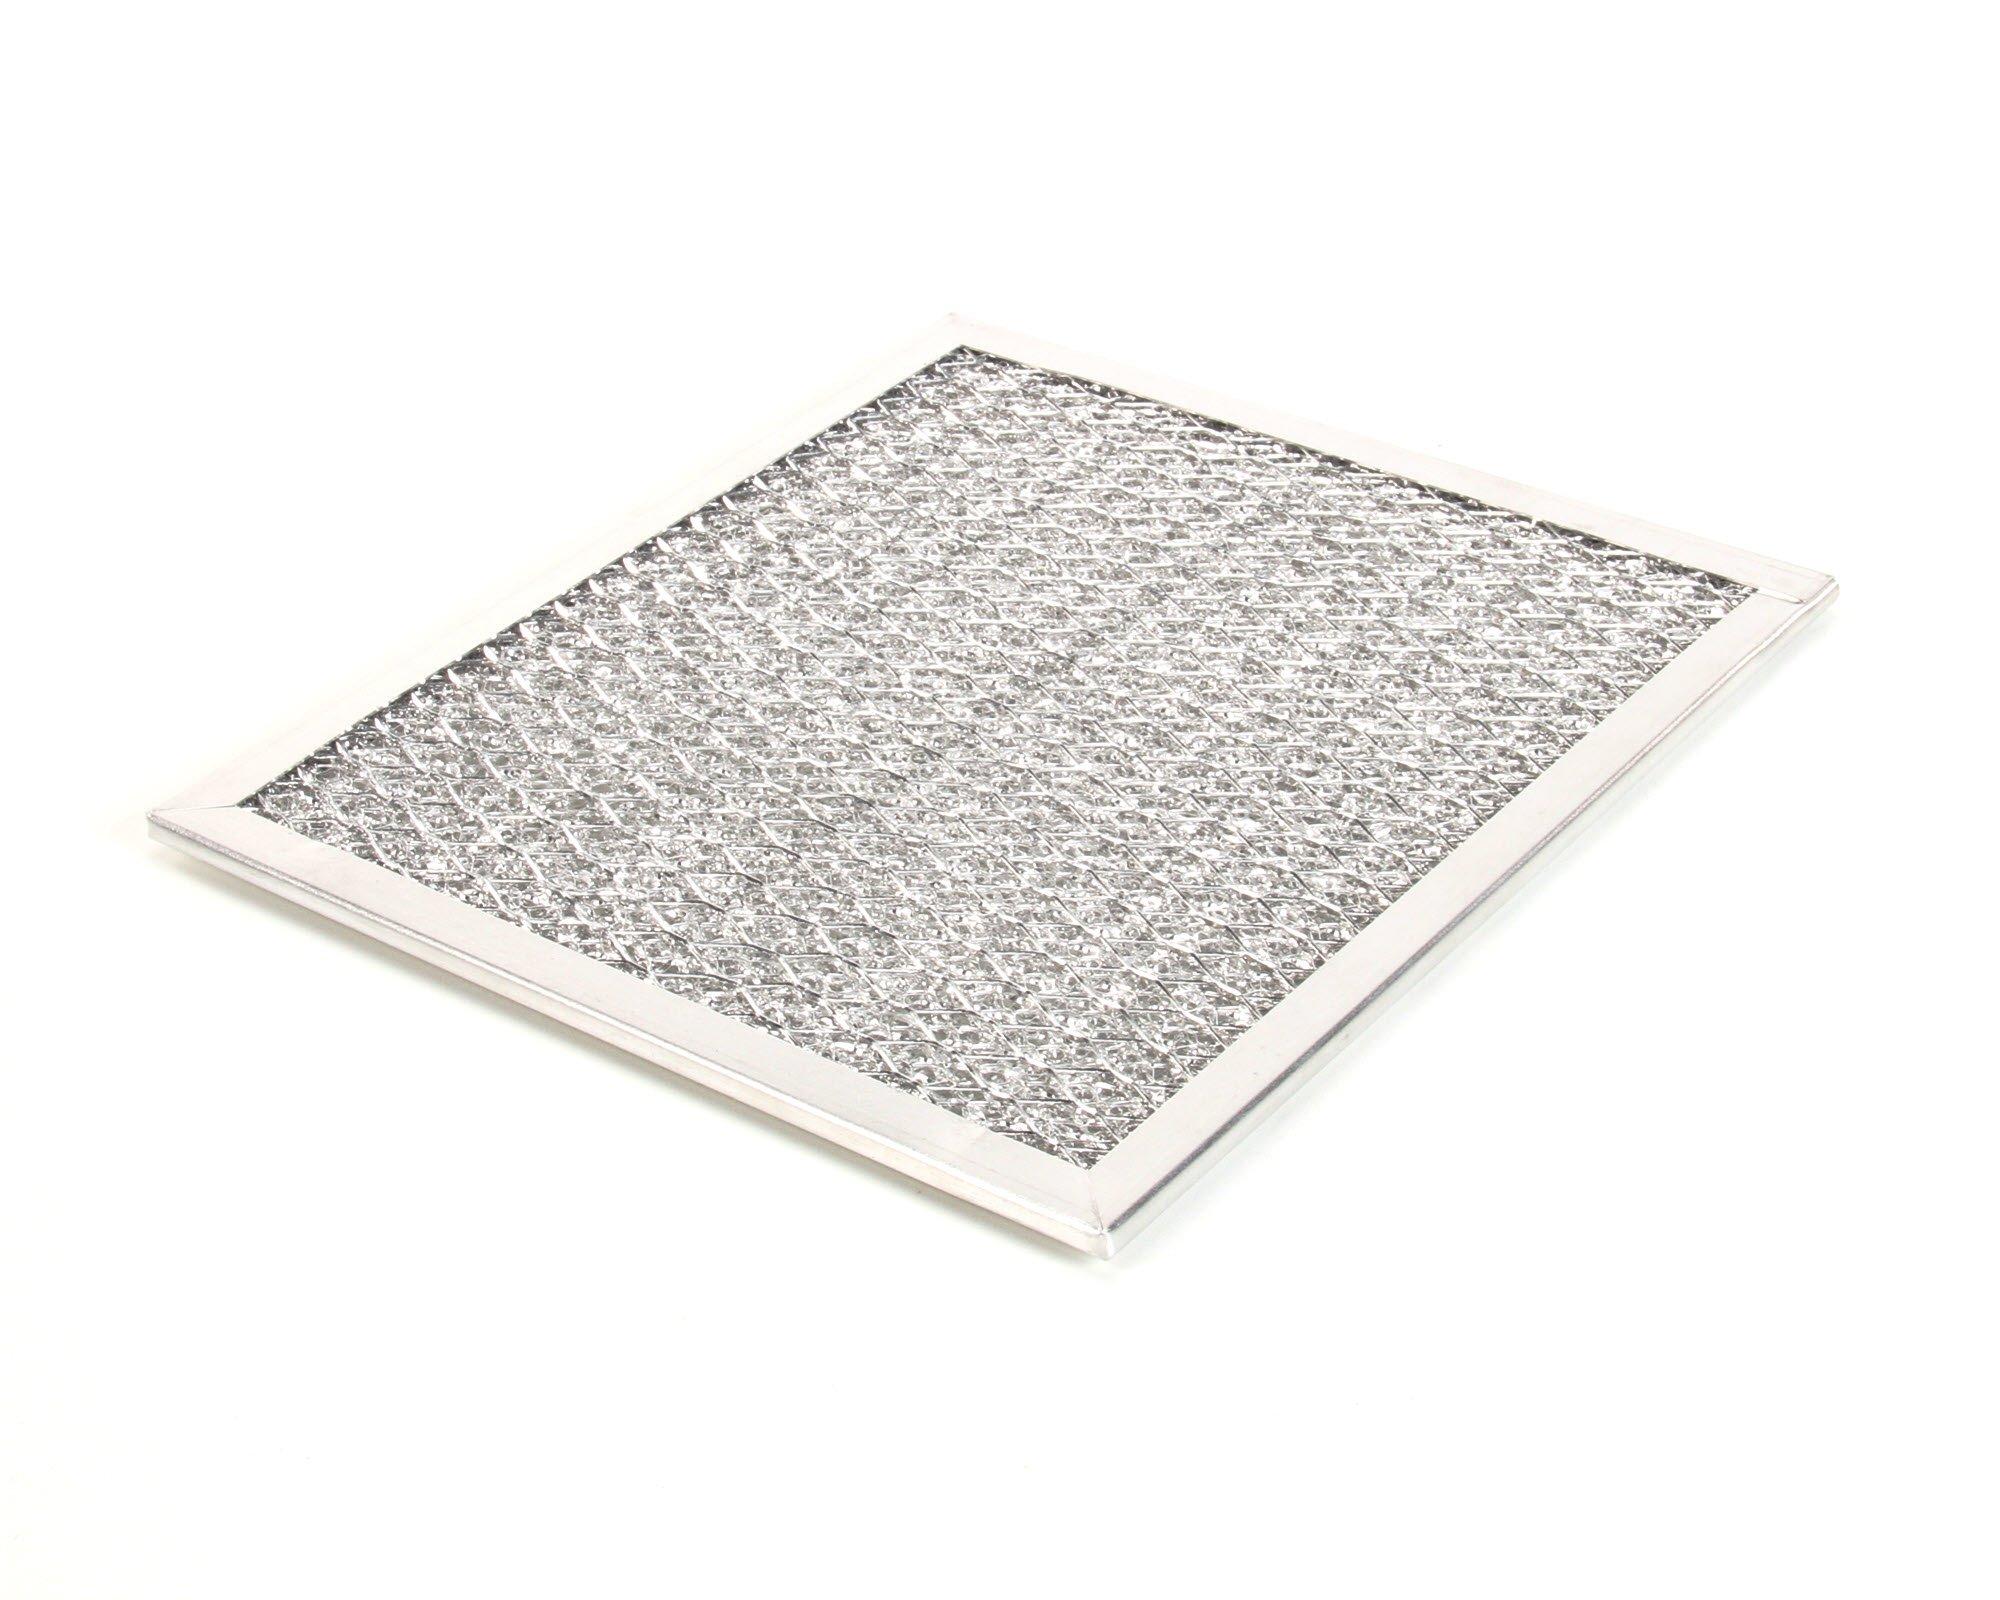 Traulsen 341-60062-04 10.875 x 9.50 Air Filter